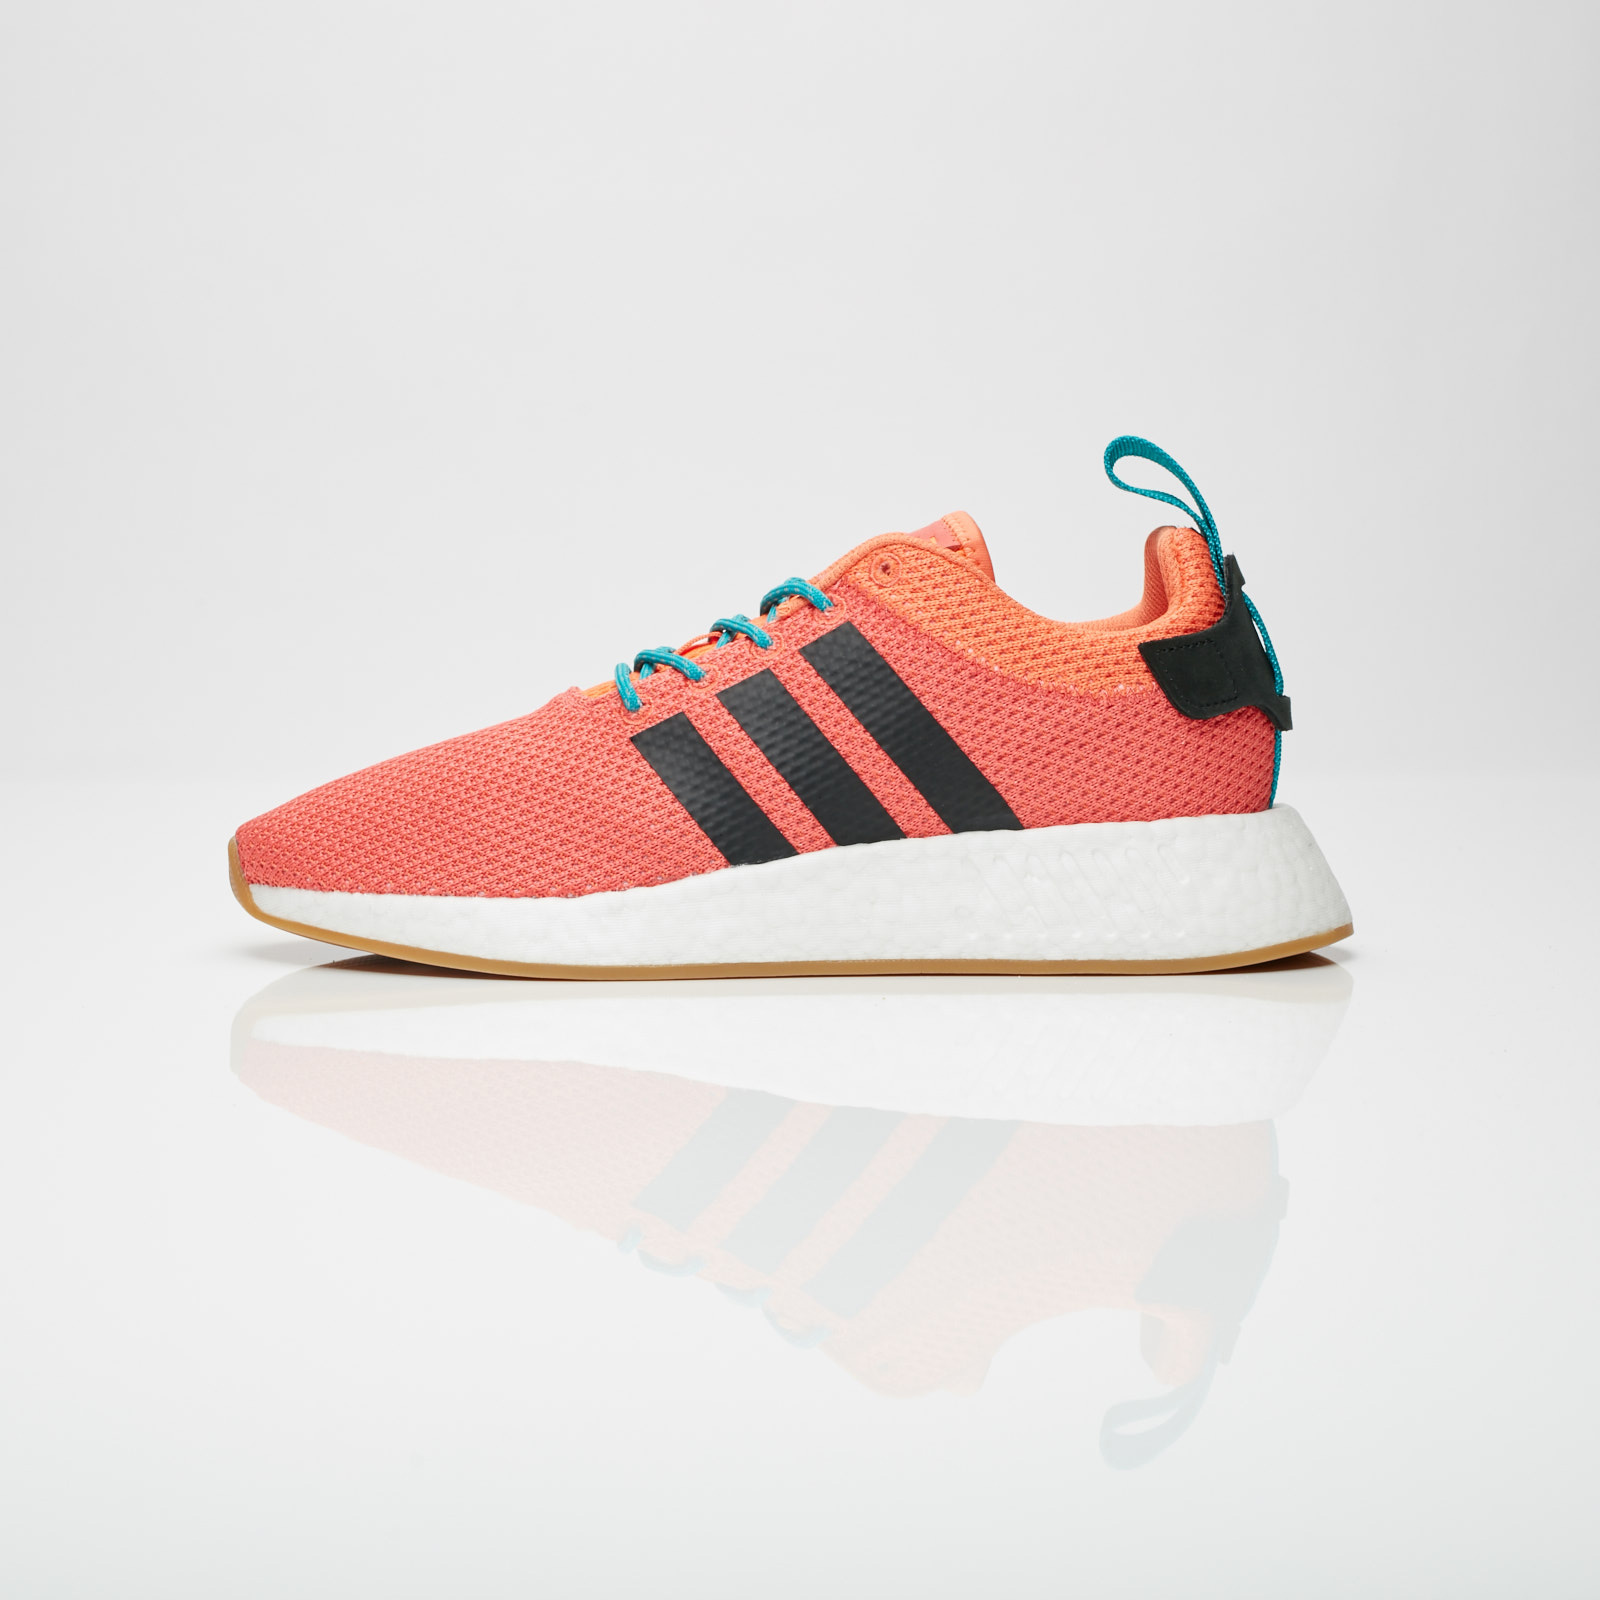 47e2ca88819 adidas NMD R2 Summer - Cq3081 - Sneakersnstuff